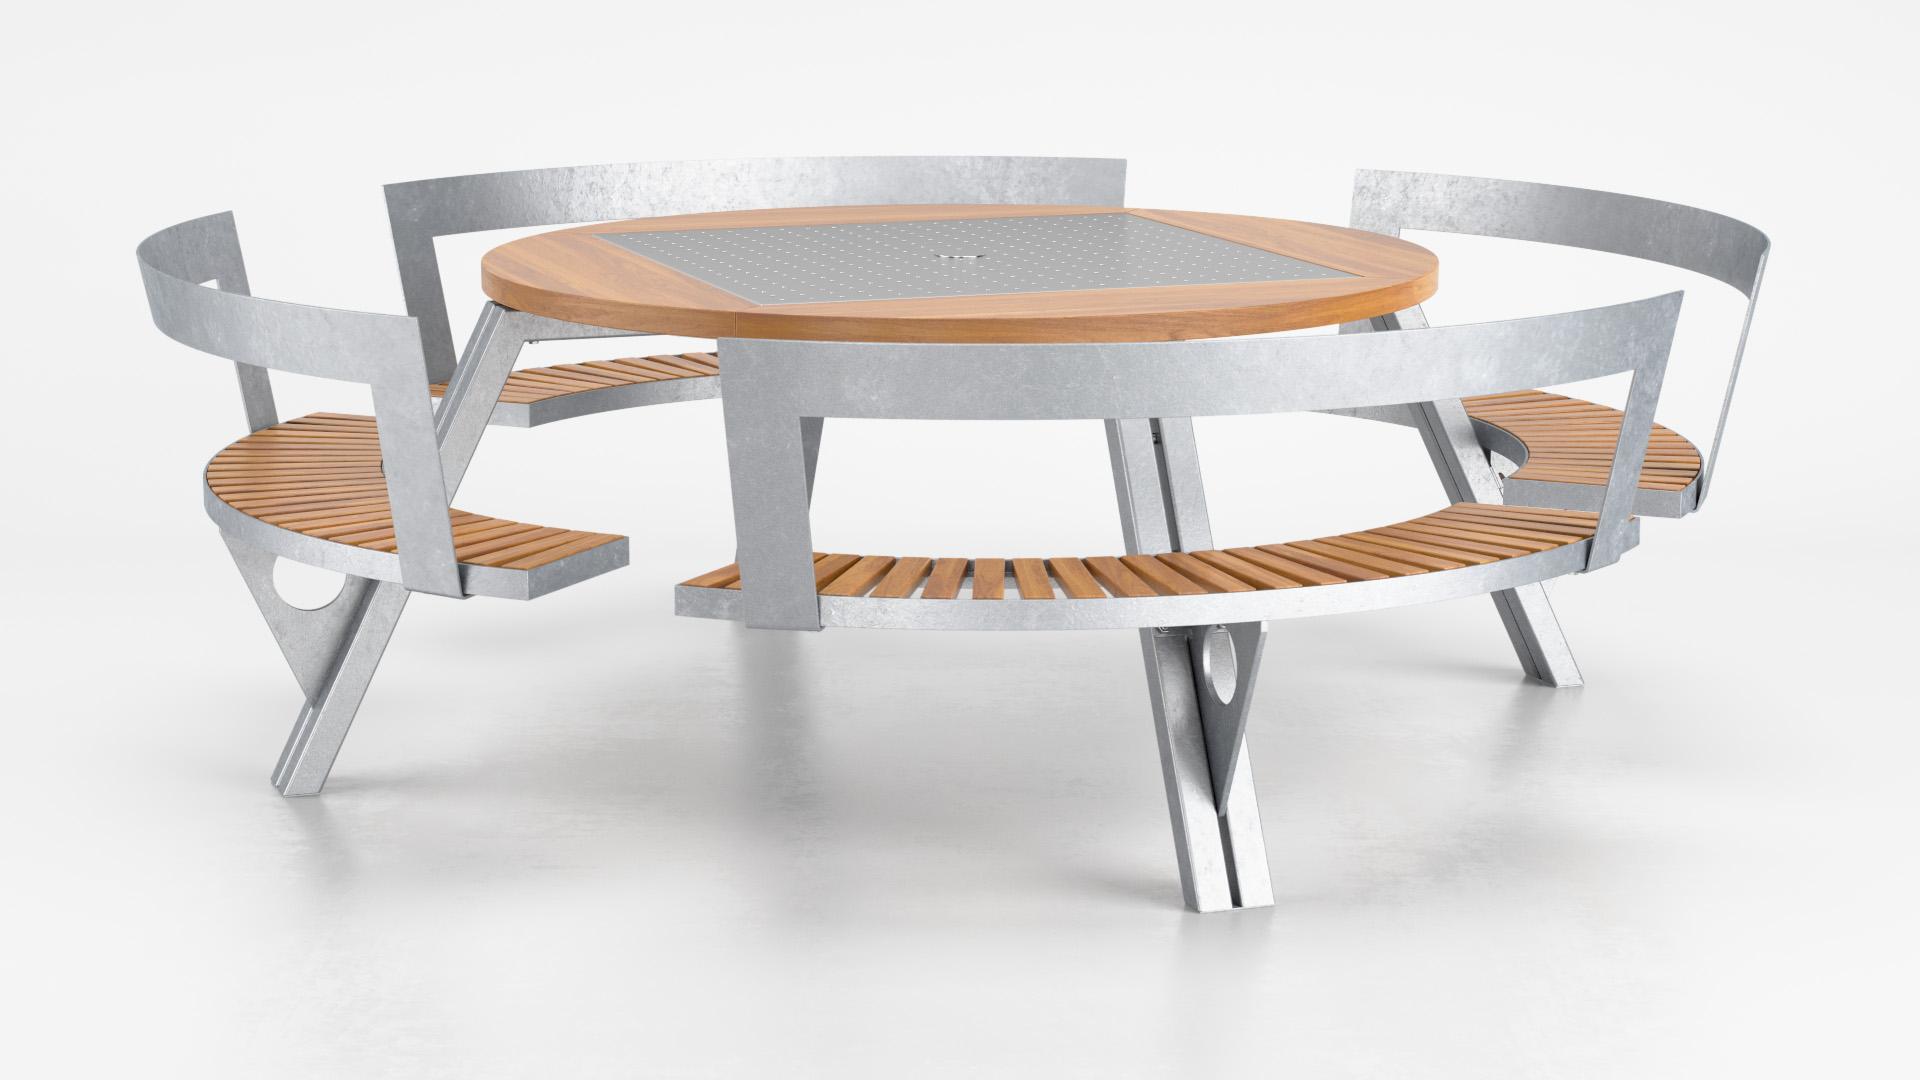 Gargantua_Table_Mode3_WhiteSet_01_0000